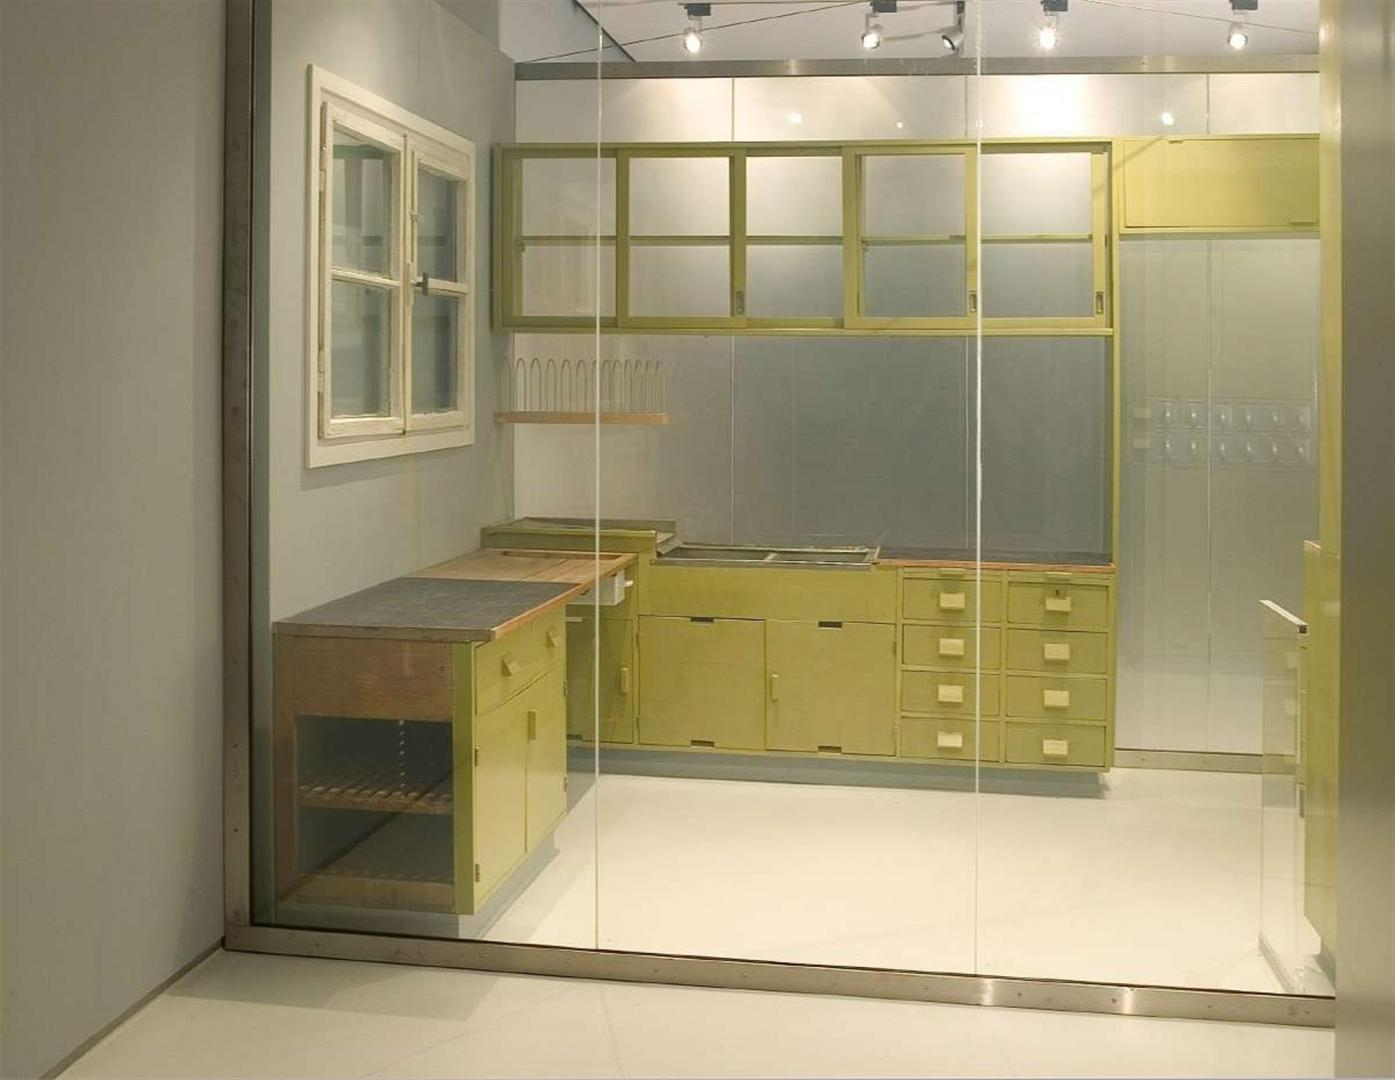 OS - Object - 17  Historisches Museum Frankfurt